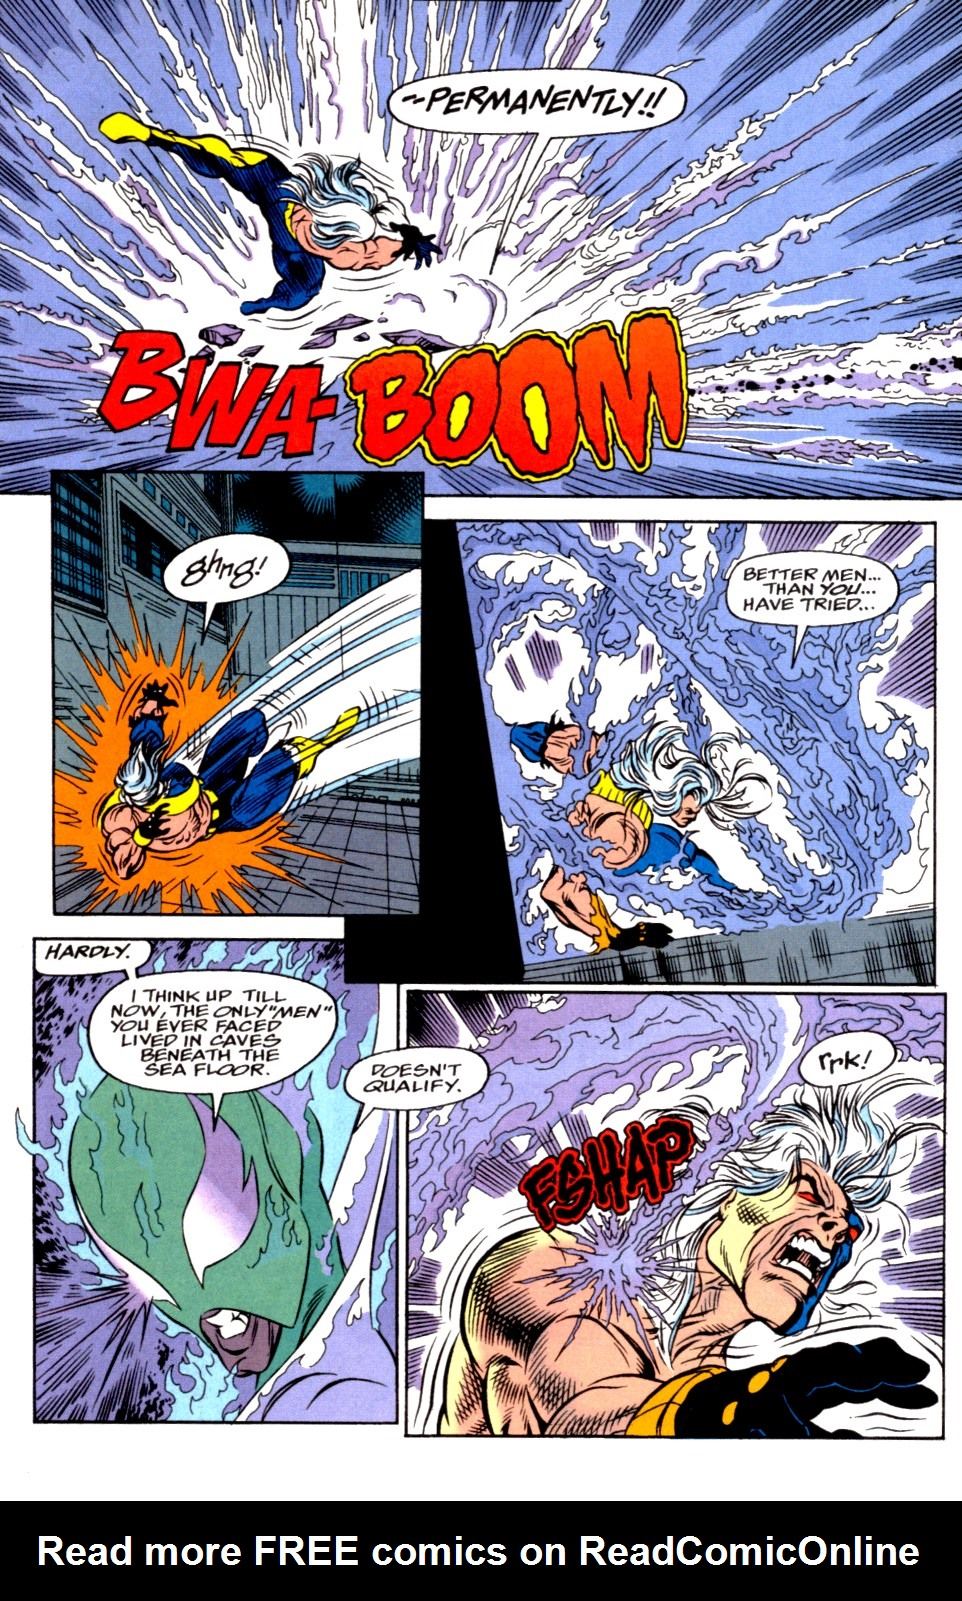 Read online Blackwulf comic -  Issue #4 - 9